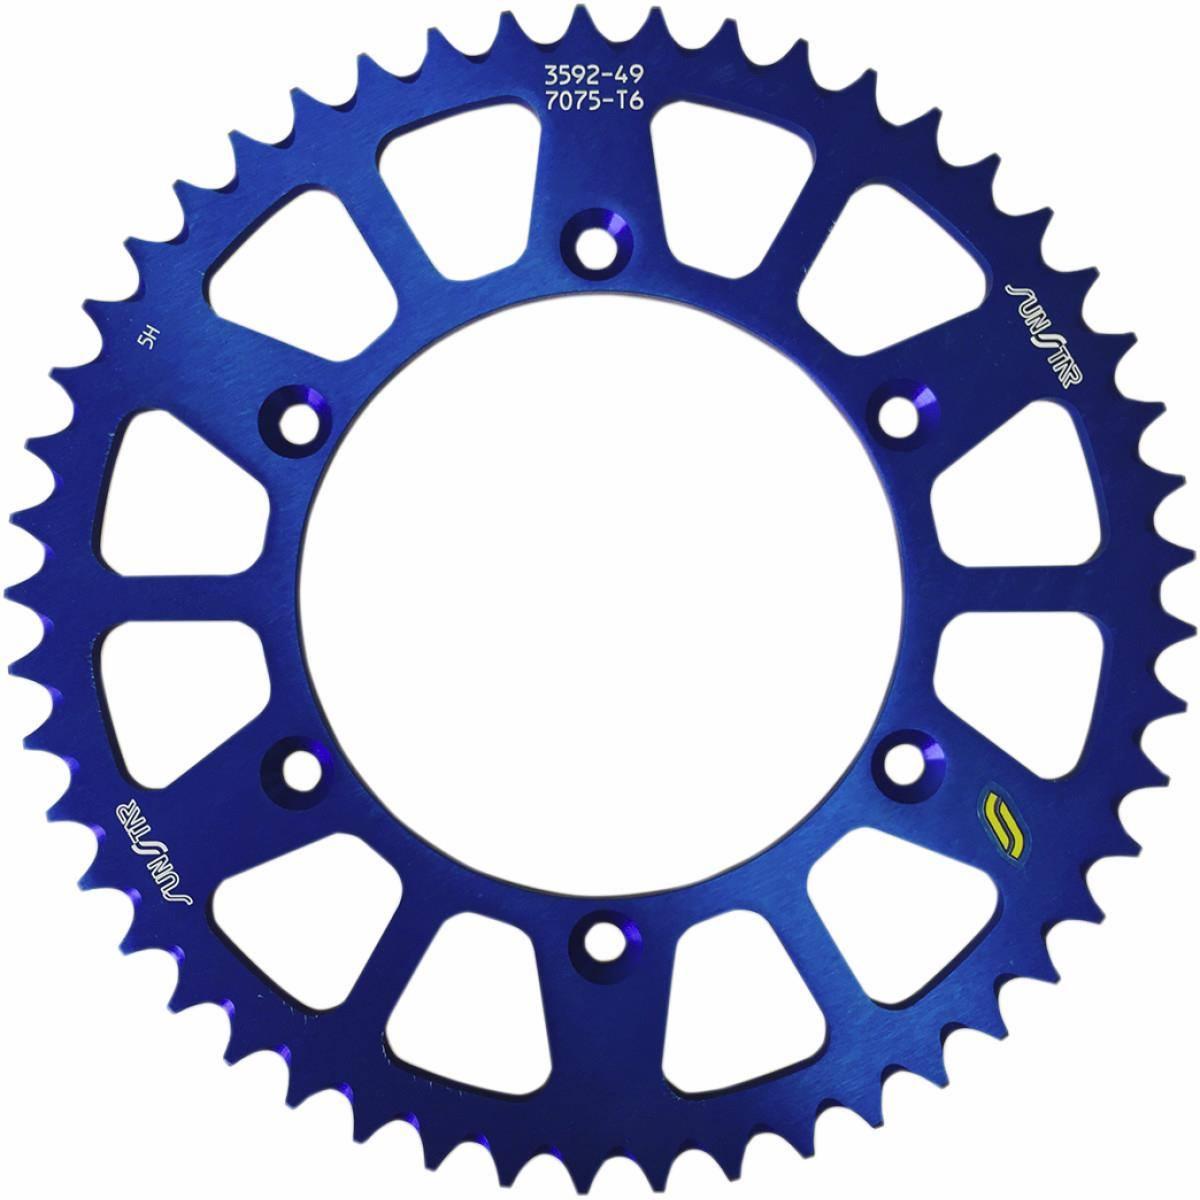 Sunstar 5-355951 Works Triplestar 51-Teeth 520 Chain Size Rear Aluminum Sprocket